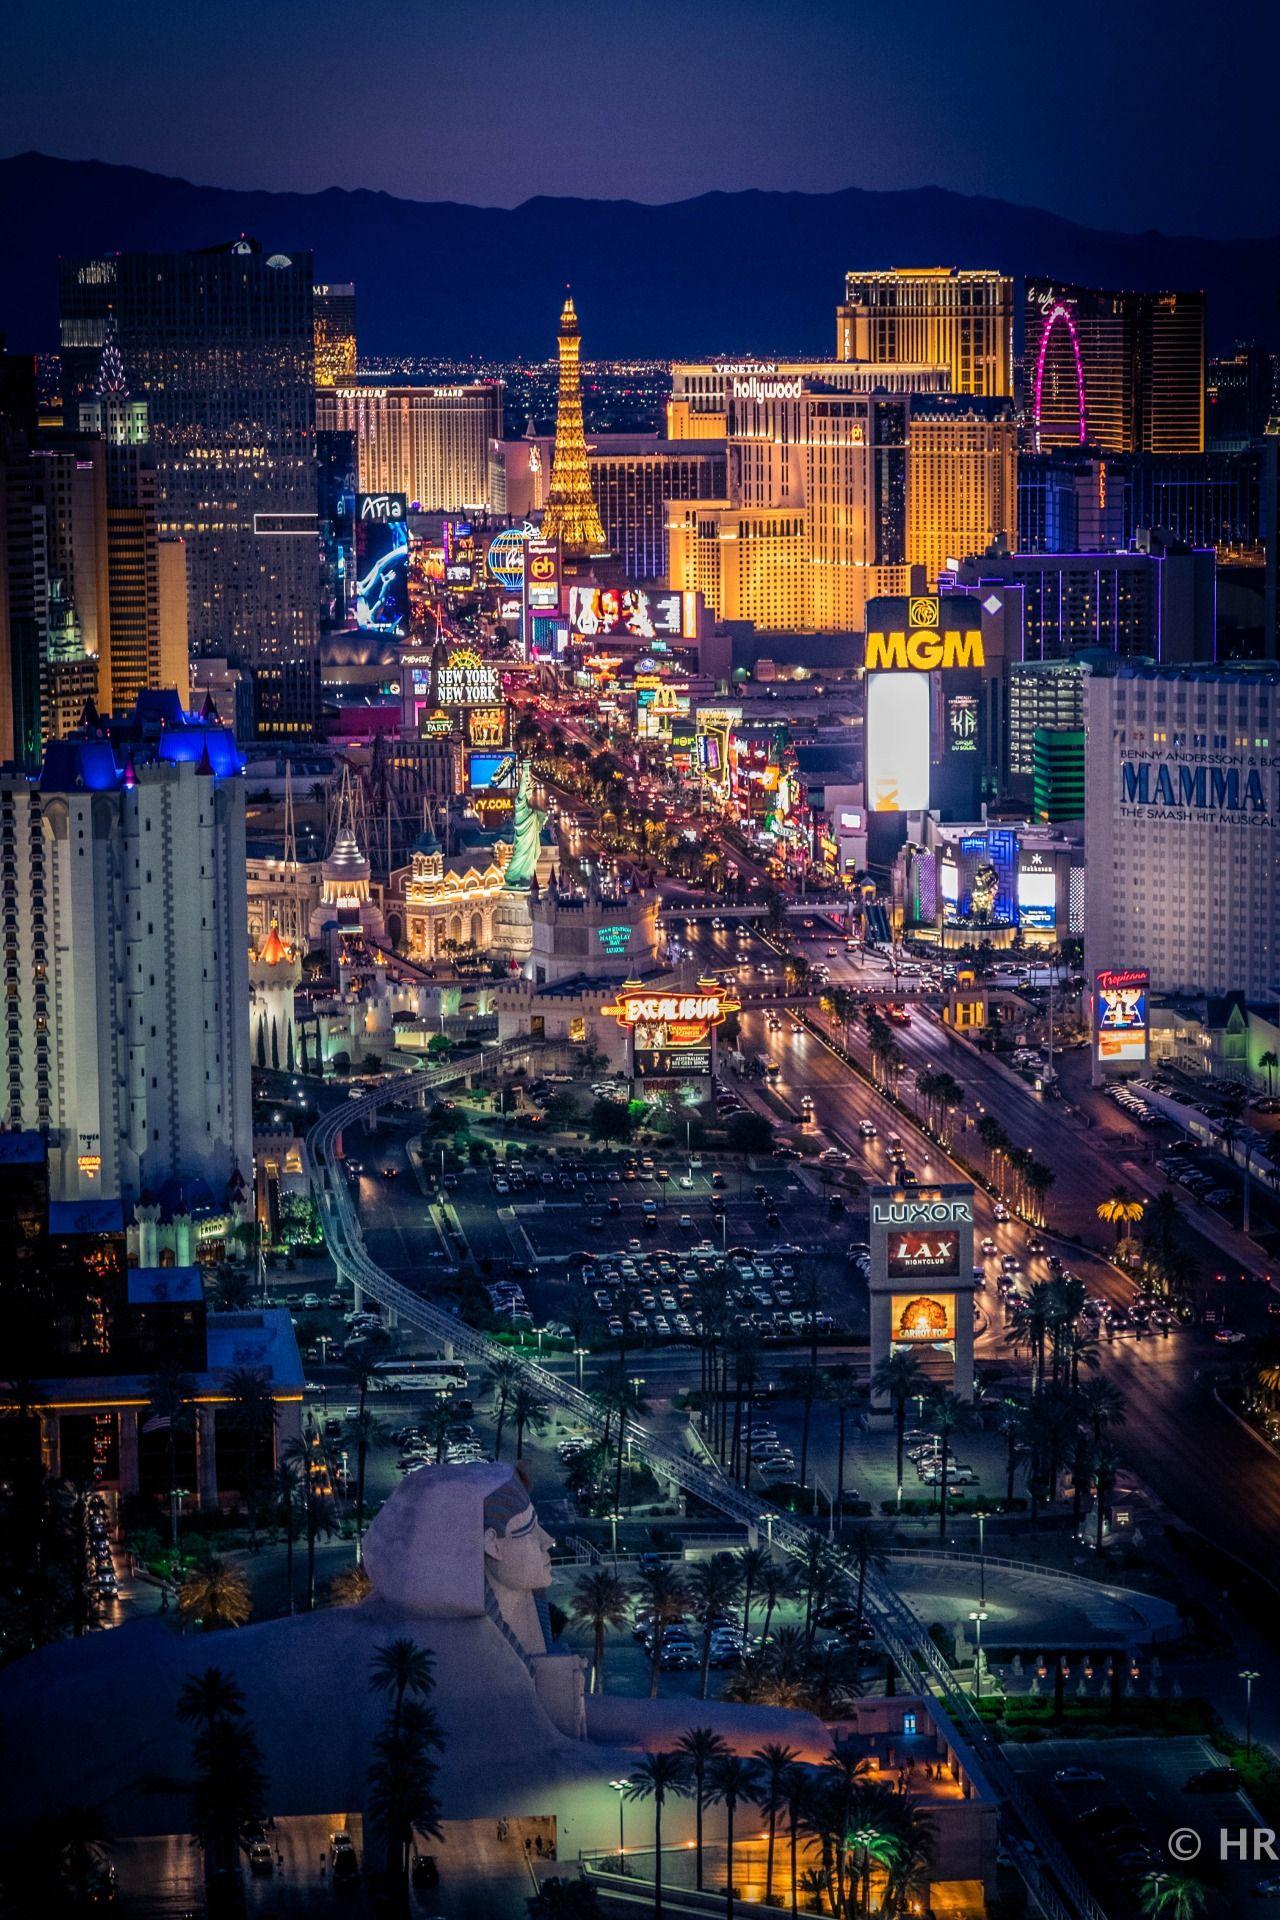 Best 20 City of las vegas ideas on Pinterest  Las vegas holidays 2016 Deals to las vegas and